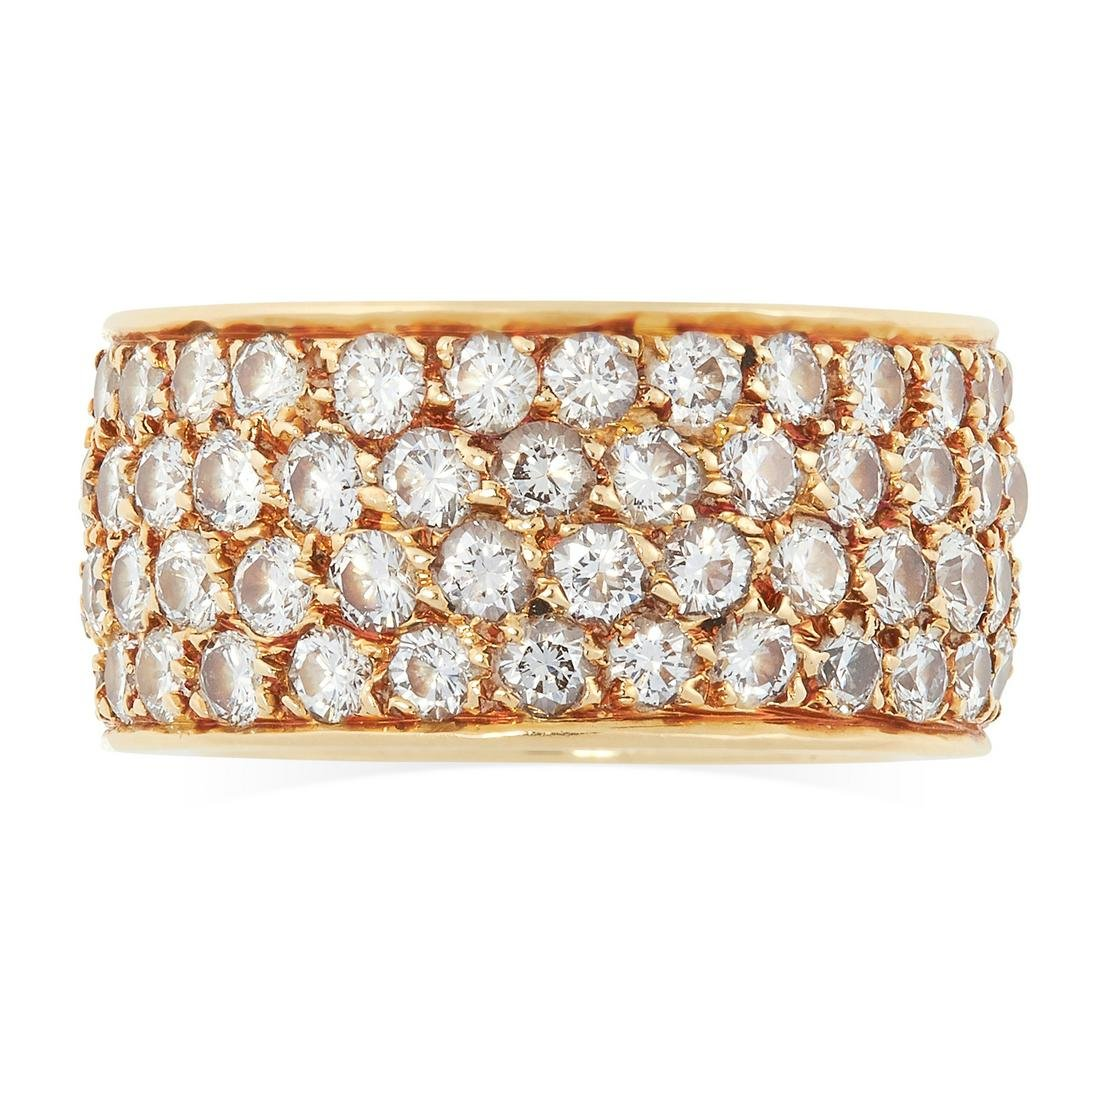 A VINTAGE DIAMOND ETERNITY BAND RING, VAN CLEEF &